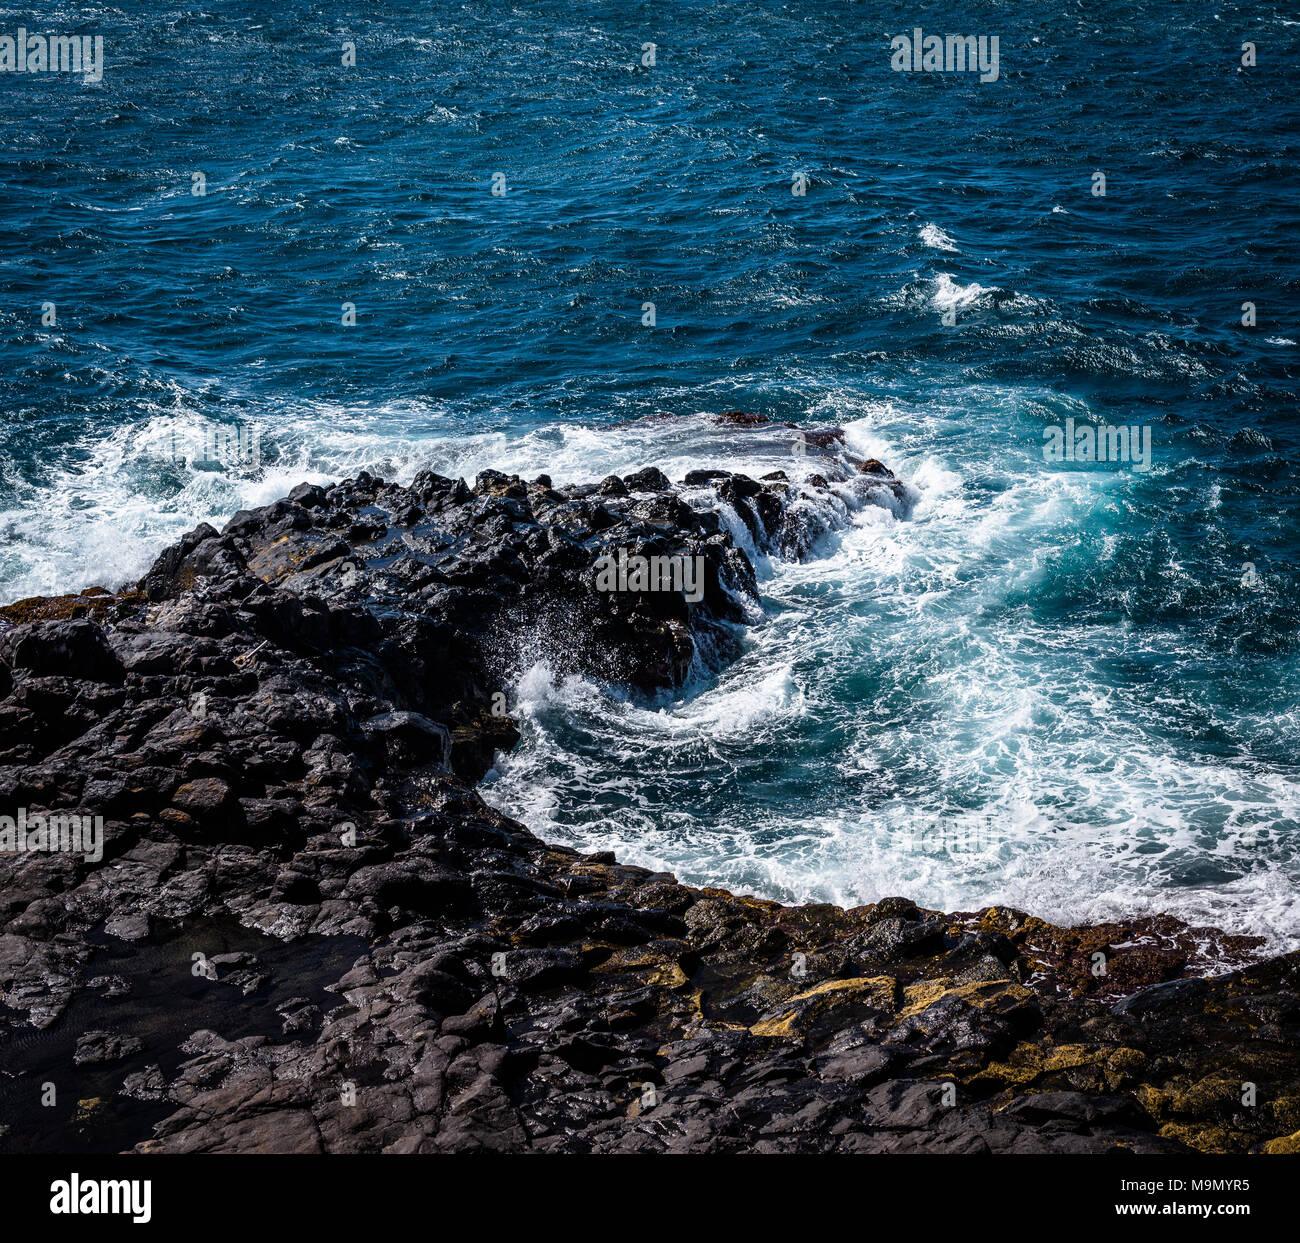 Coastal rocks and waves on Tenerife, Canary Island, Spain. - Stock Image